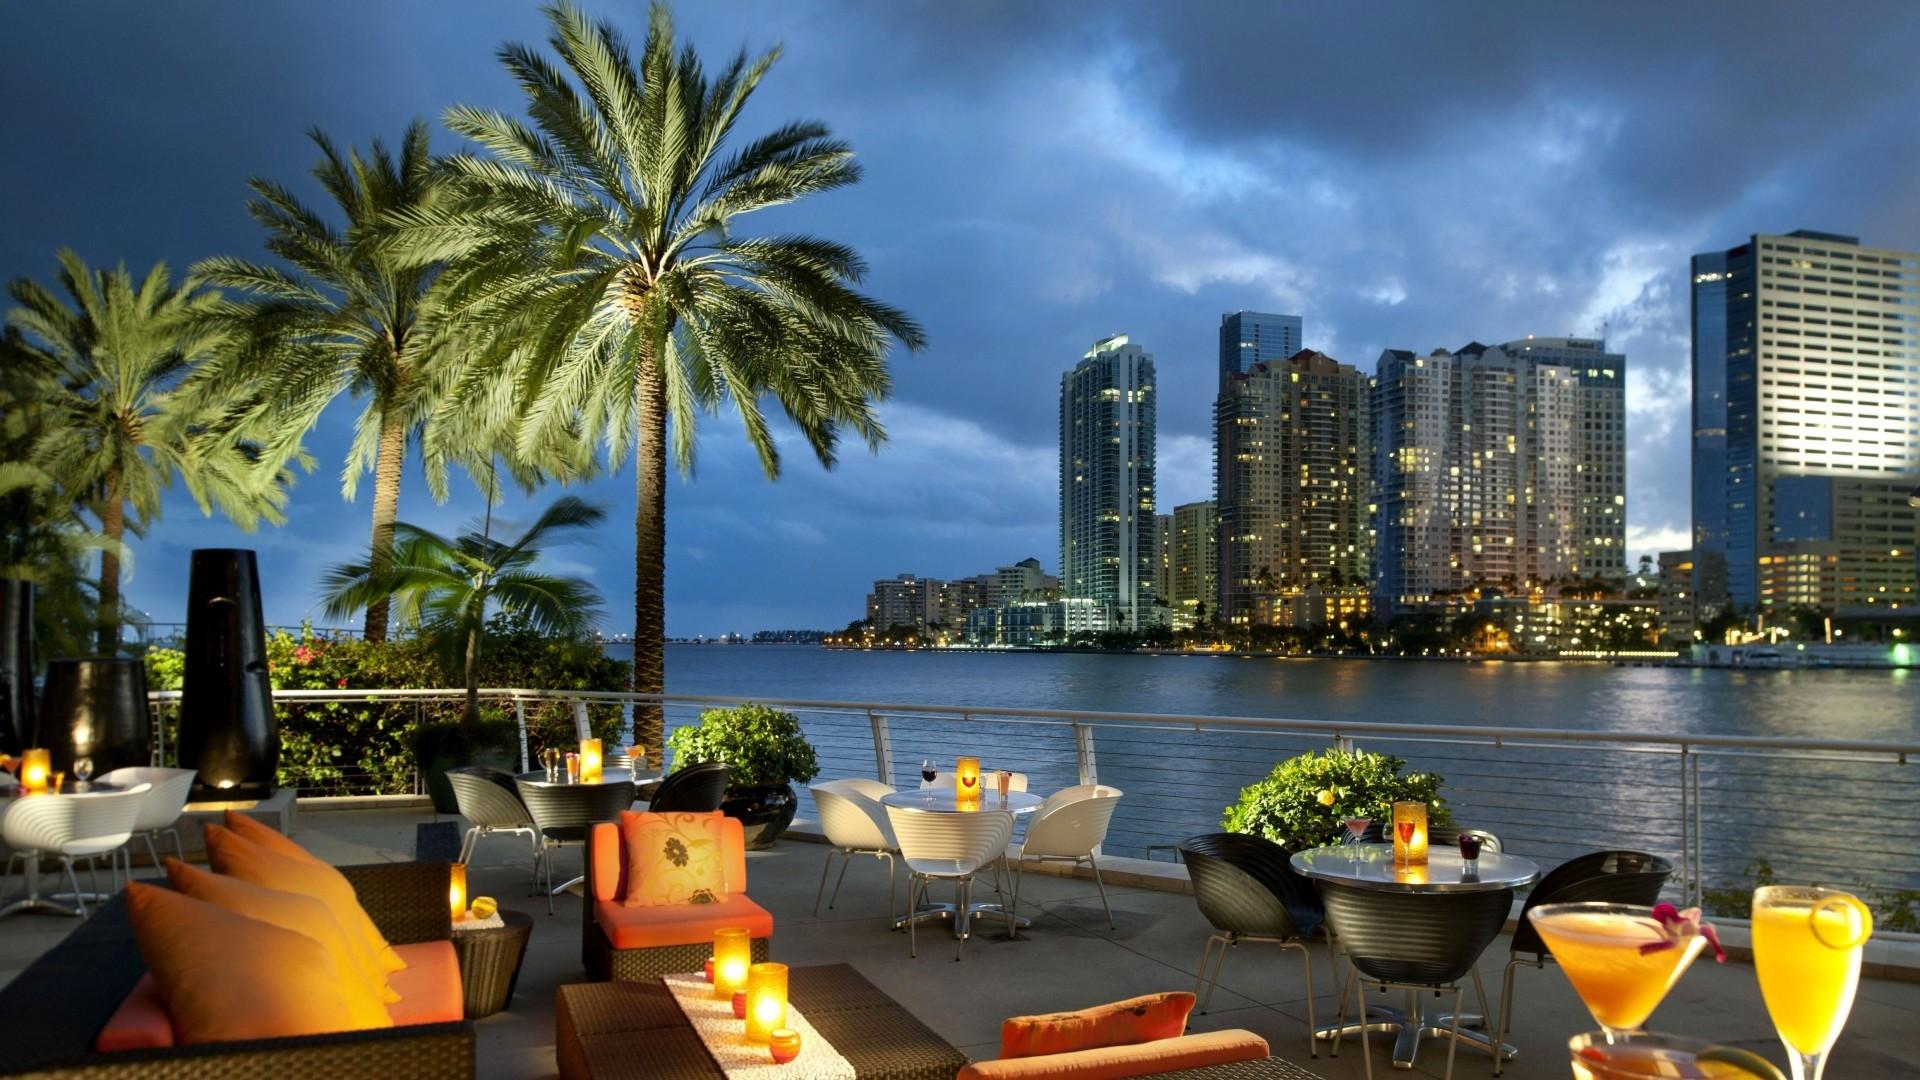 Miami Desktop Wallpaper 57 Images